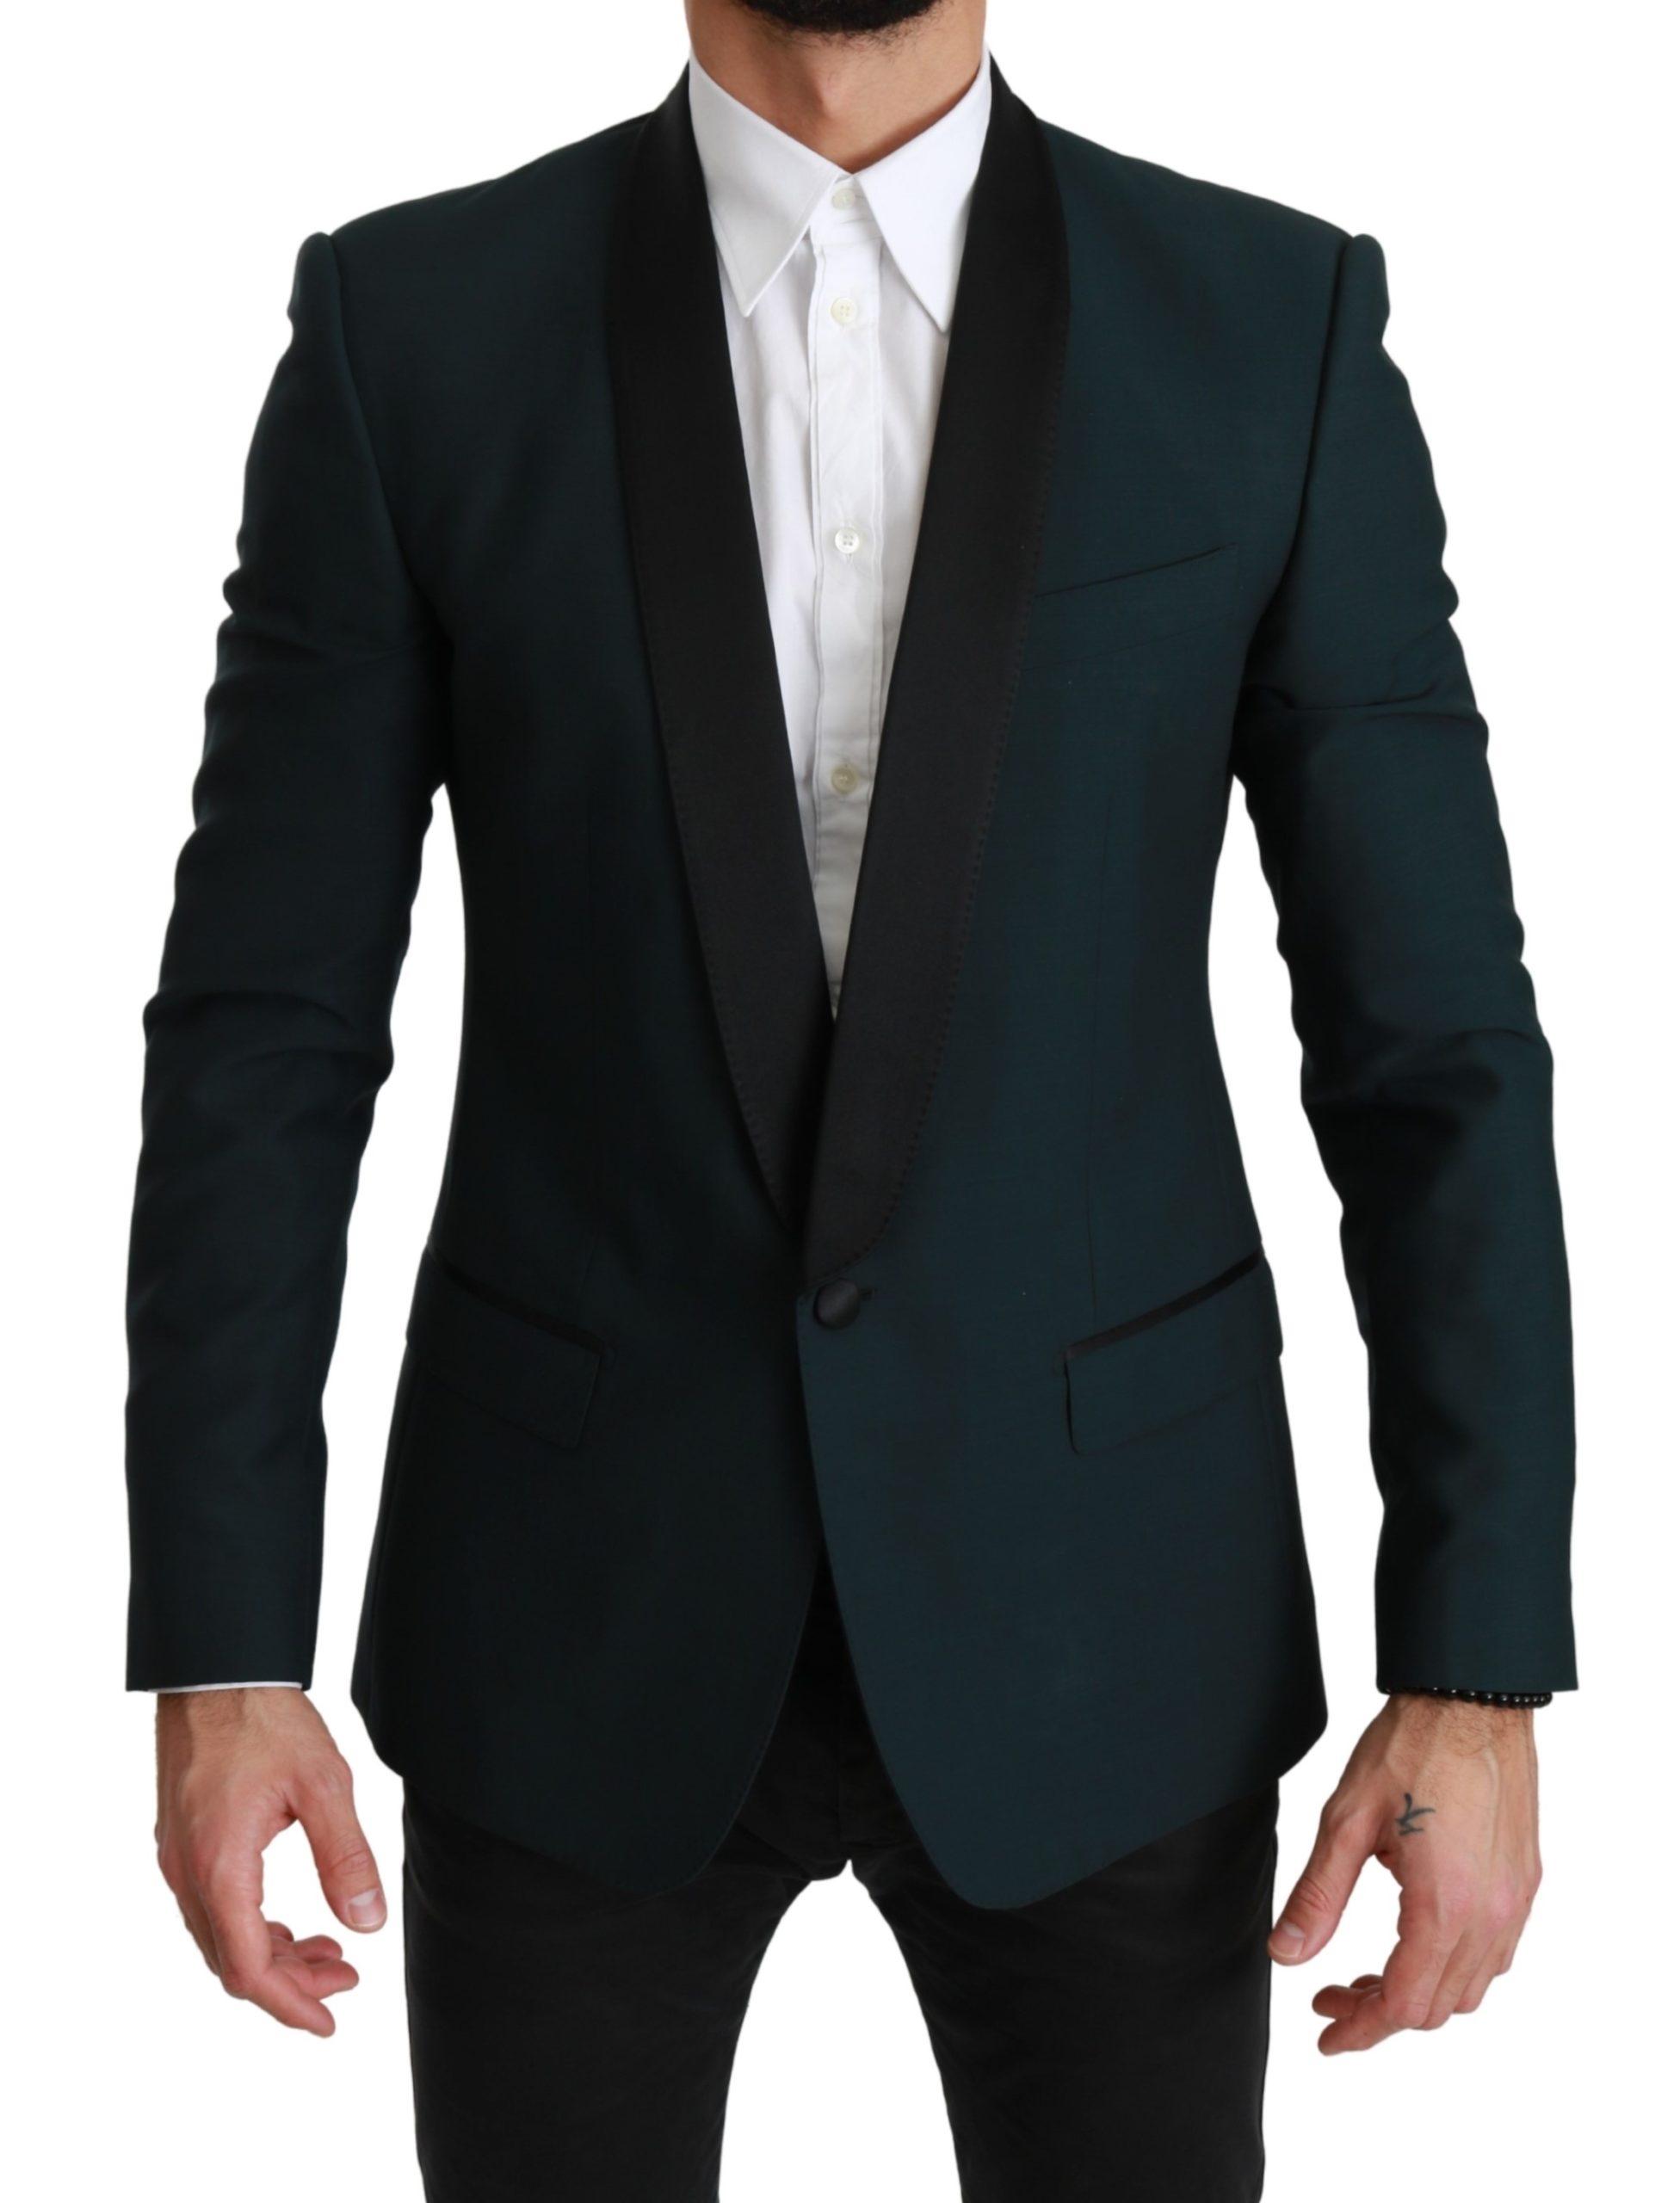 Dolce & Gabbana Men's Wool MARTINI Logo Blazer Green JKT2606 - IT48 | M